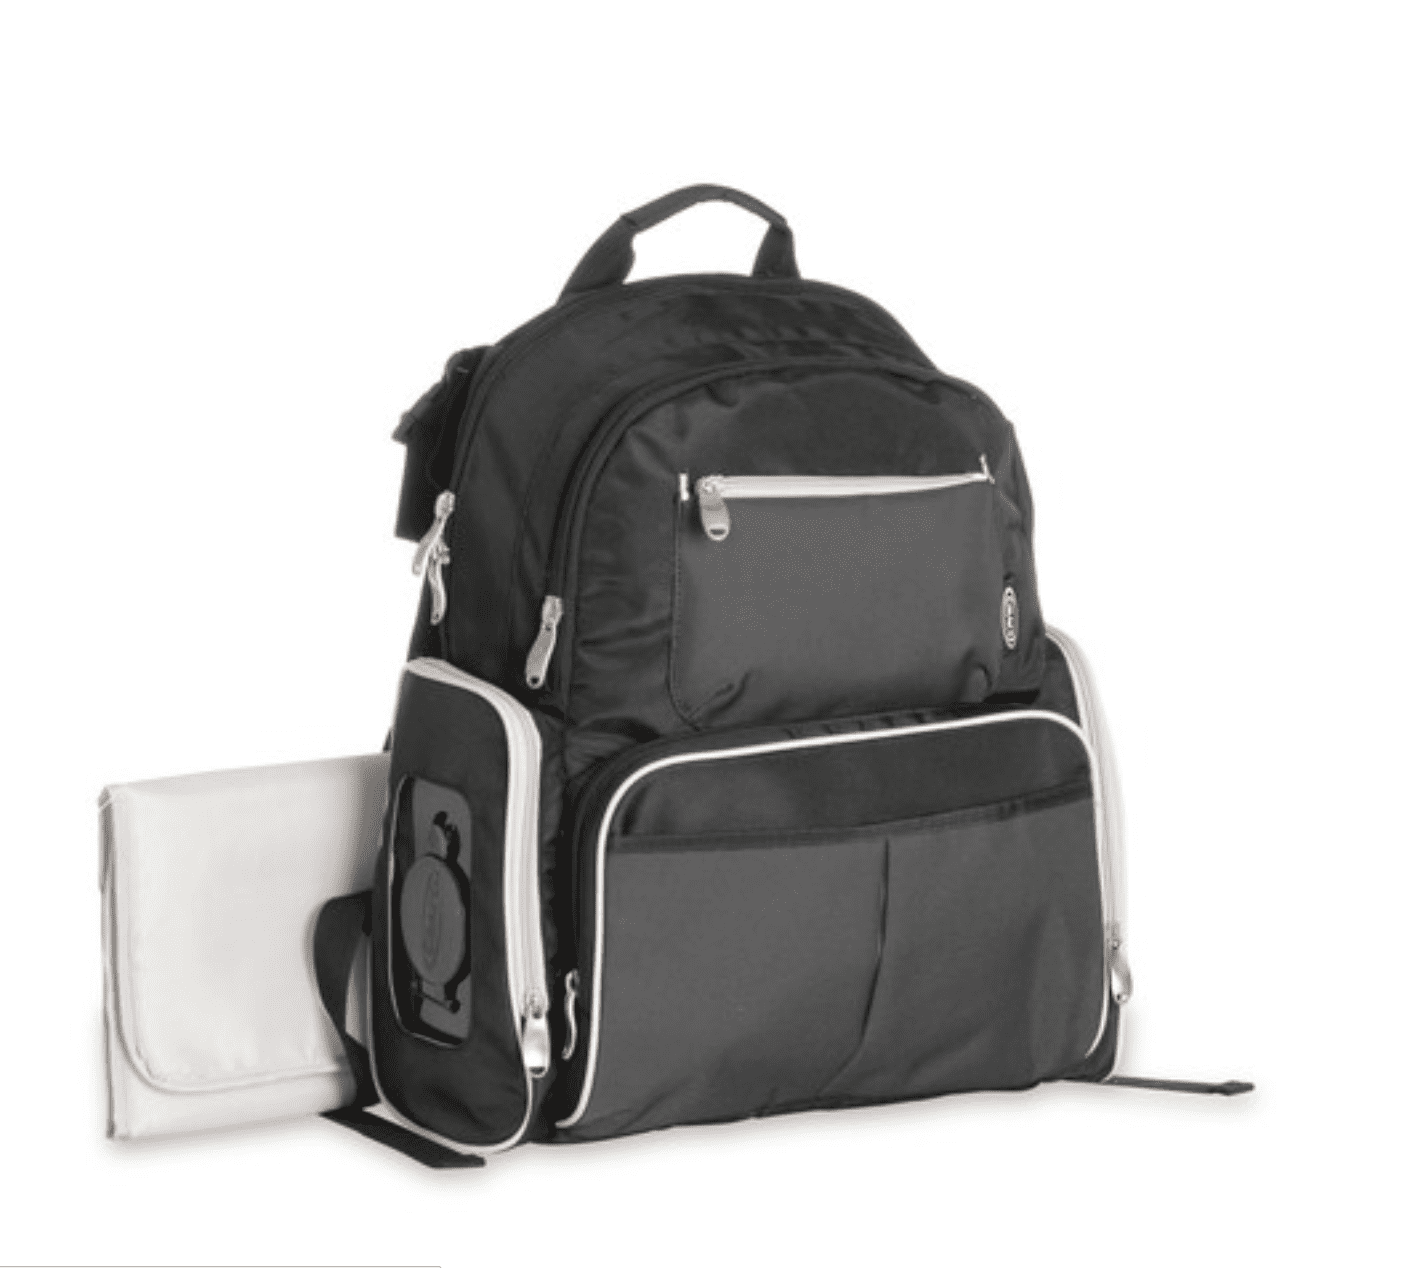 Best for Twins  Graco Gotham Backpack Diaper Bag acc12bf4944b1